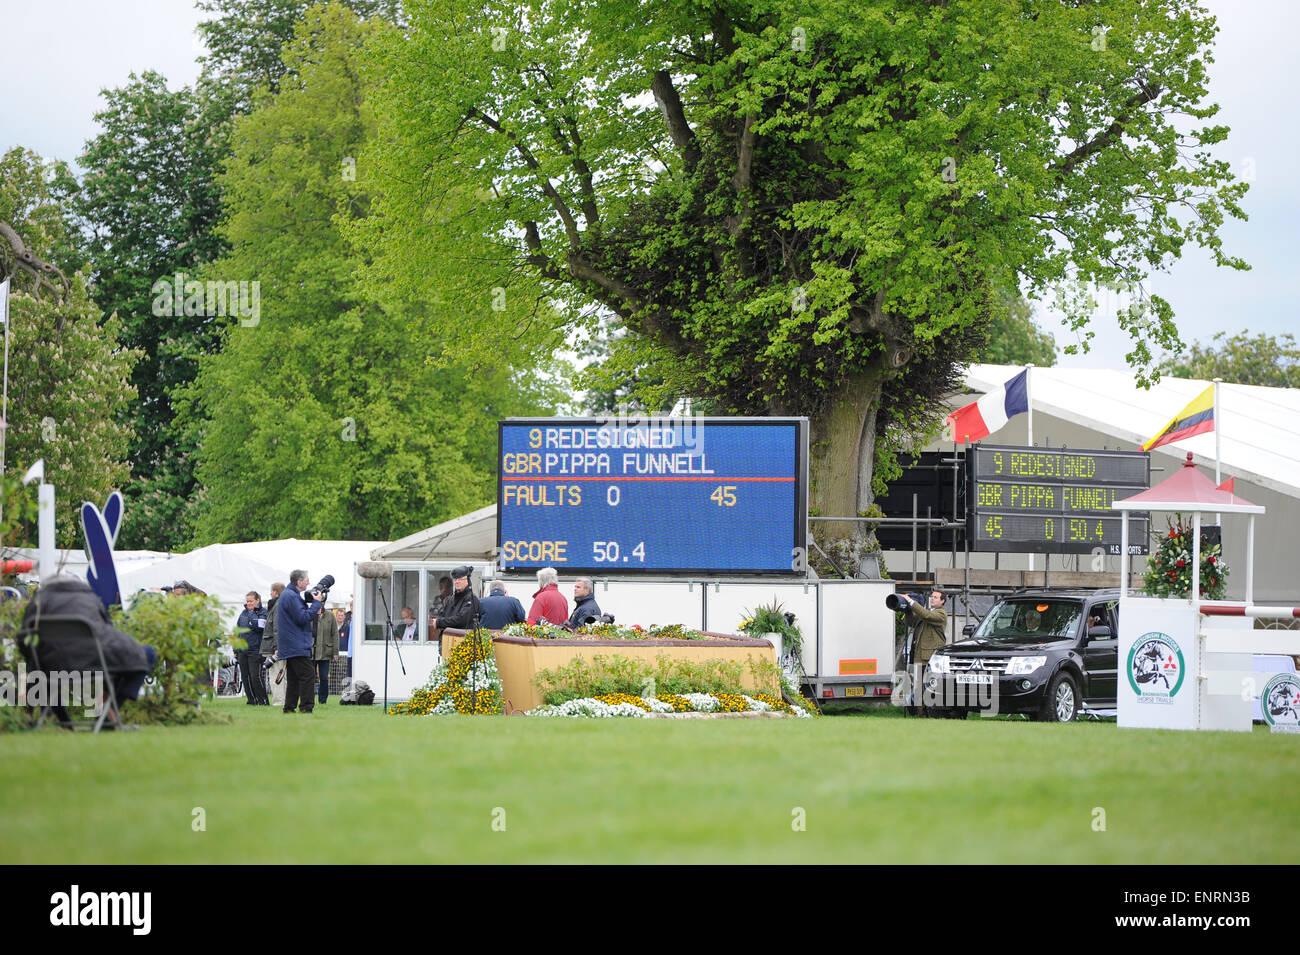 Badminton, UK. 10th May, 2015. Mitsubishi Motors Badminton Horse Trials 2015. Badminton, England. Rolex Grand Slam - Stock Image